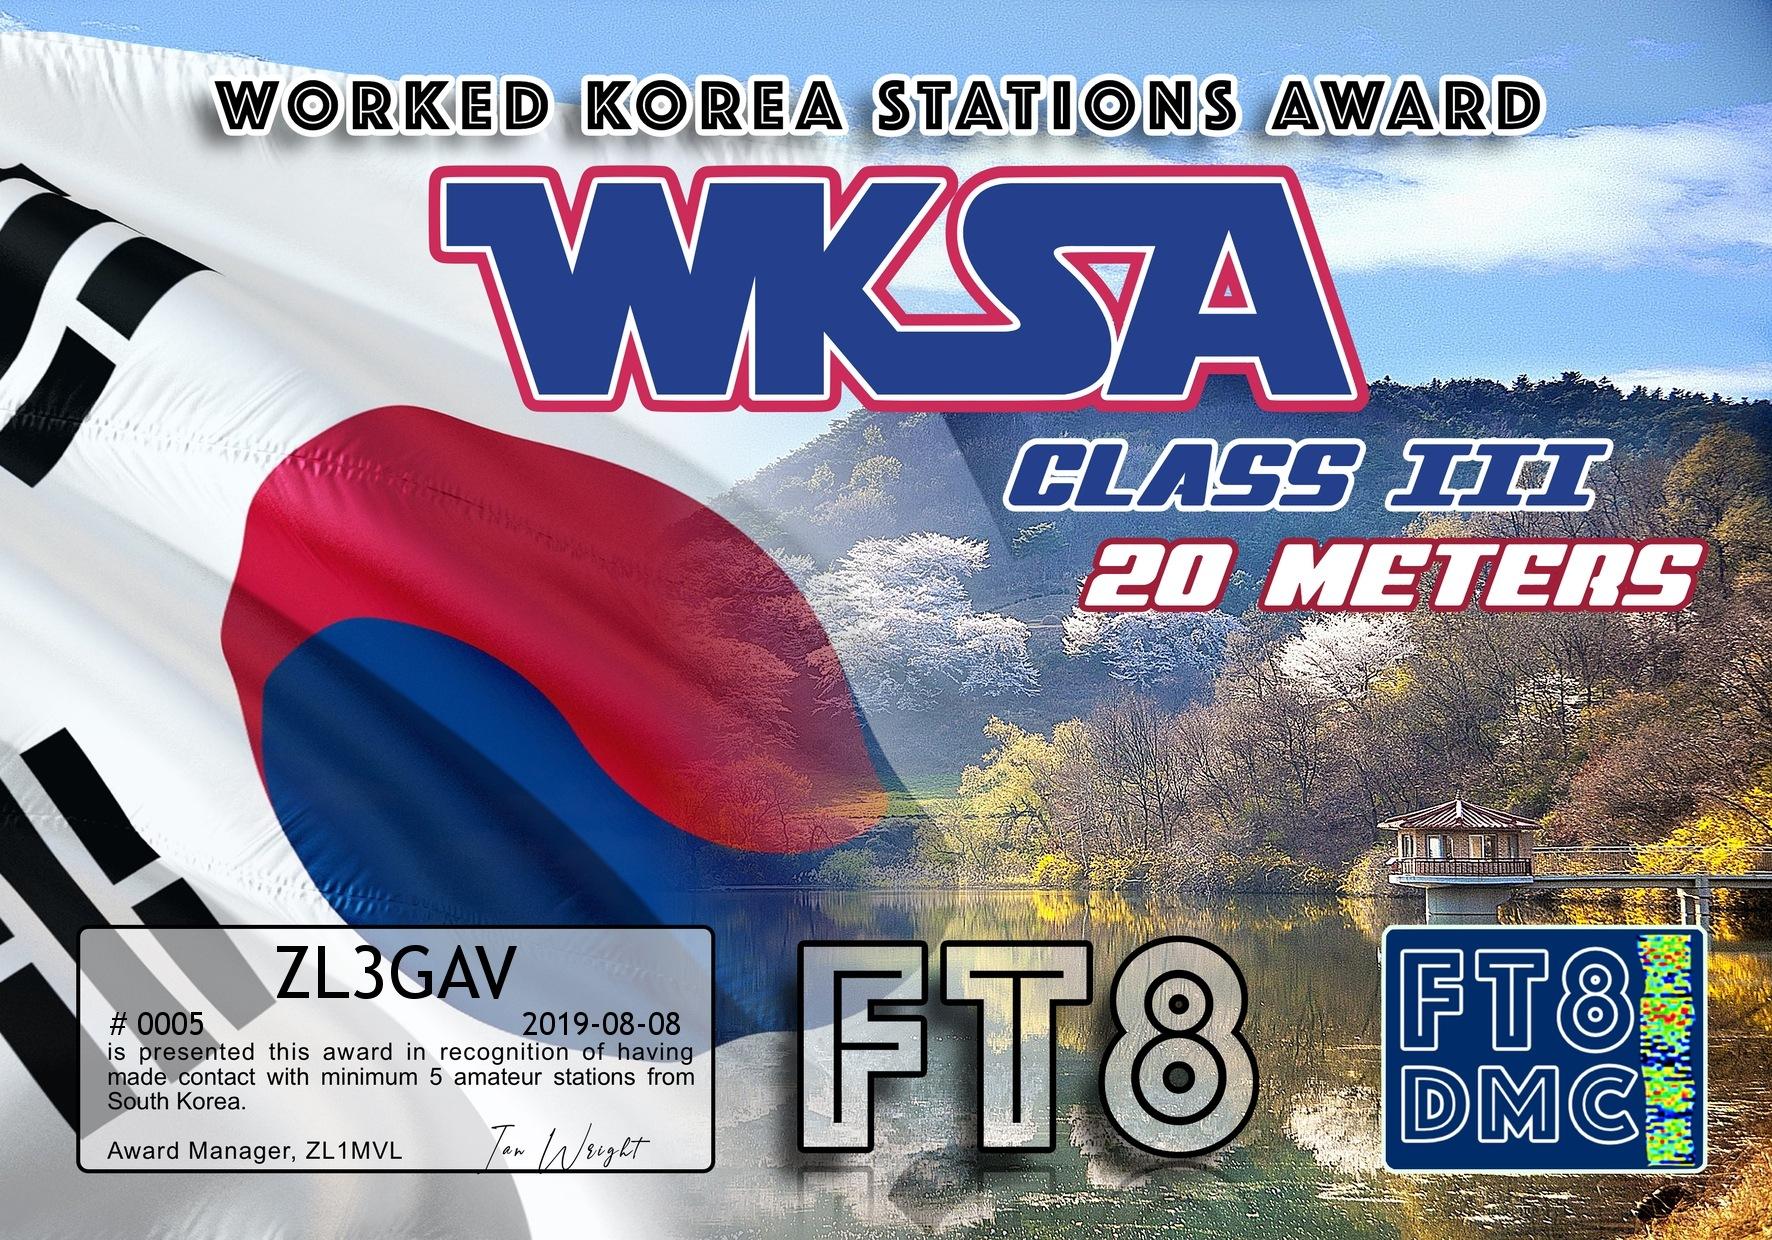 ZL3GAV-WKSA20-III.jpg